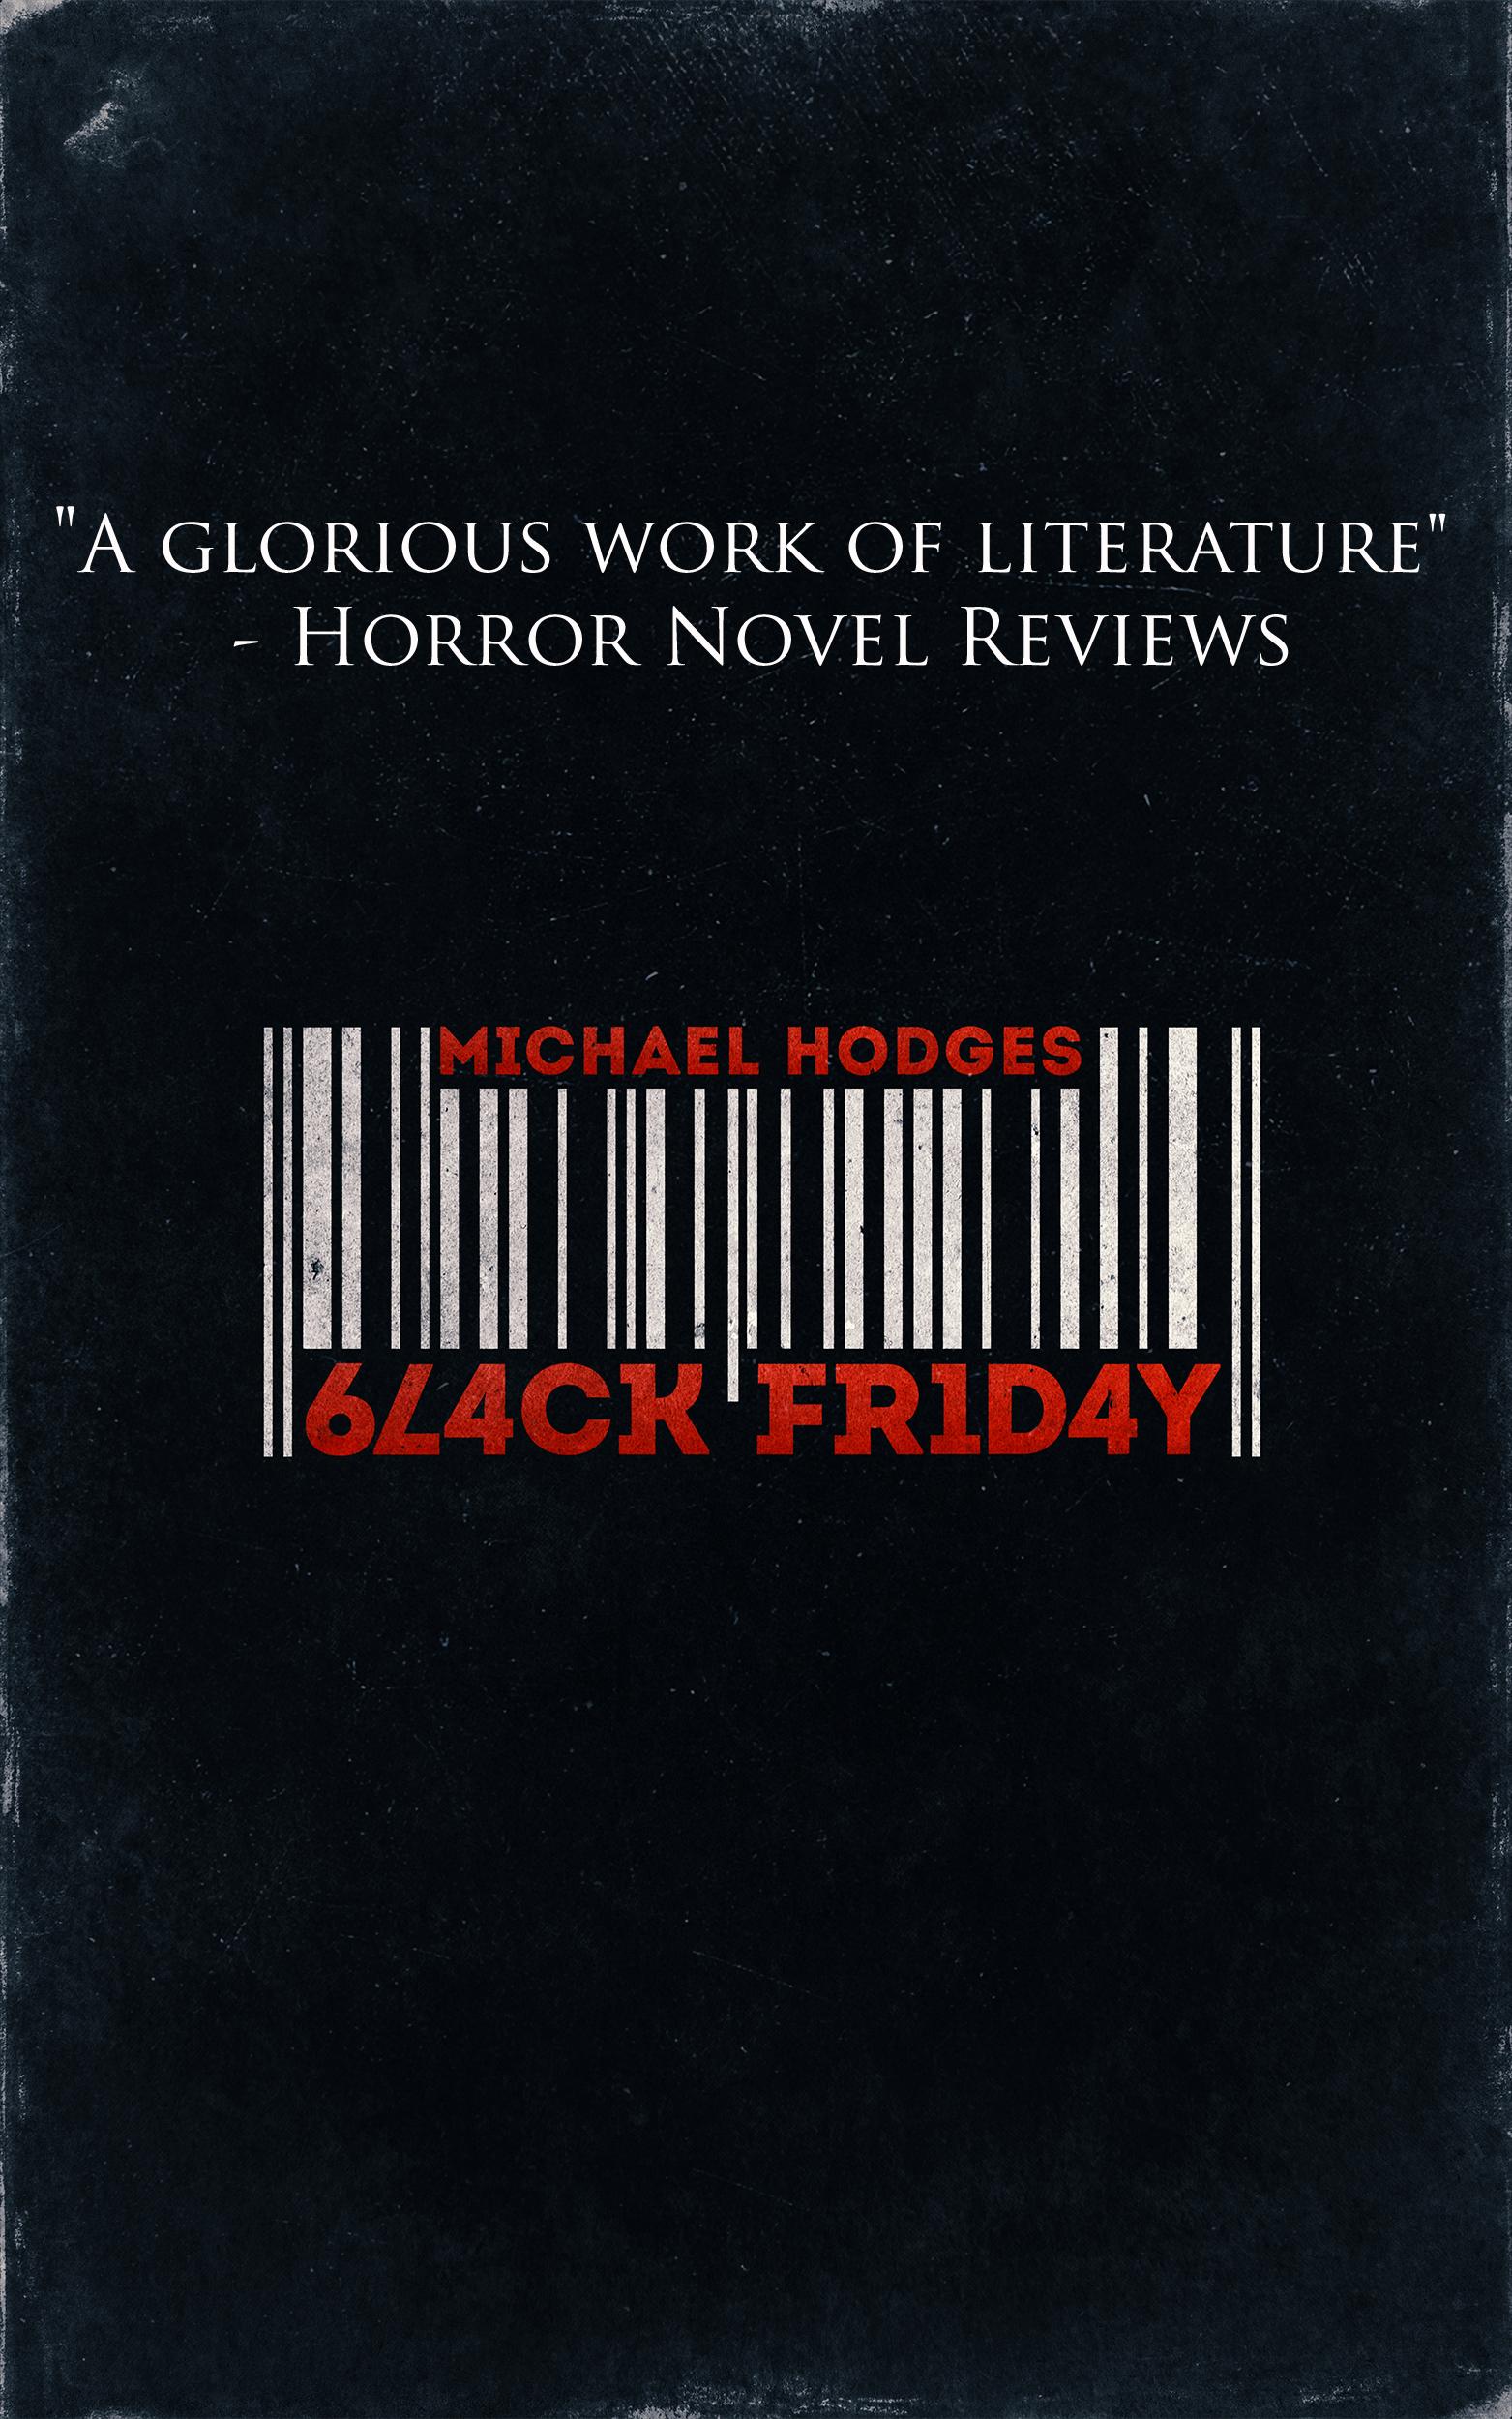 Black-Friday-Cover-blurb